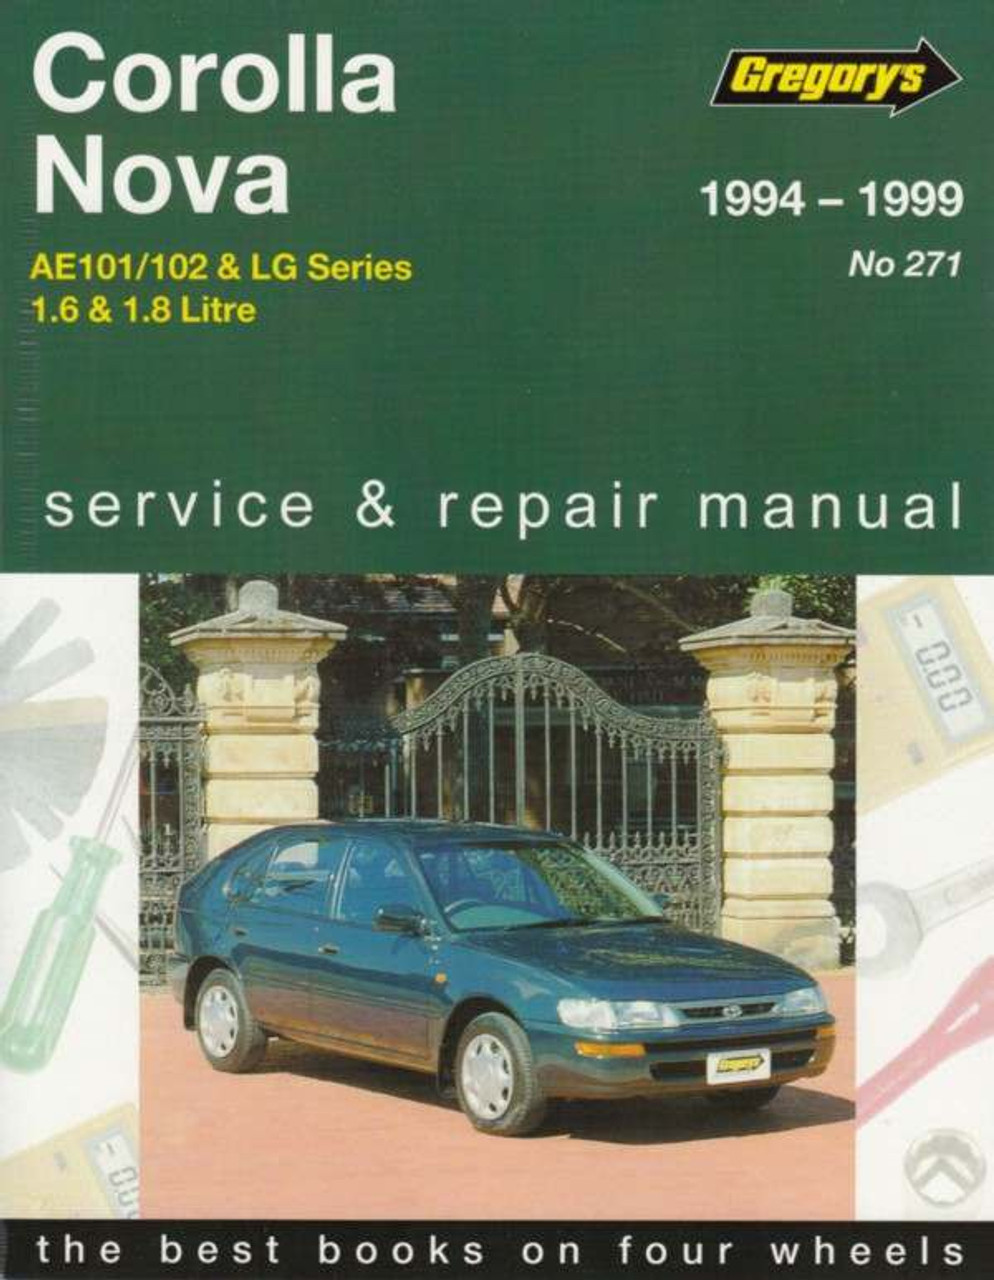 toyota corolla ae101 ae102 amp holden nova lg 1994 1999 rh automotobookshop com au 1999 toyota corolla service manual pdf 1999 toyota corolla service repair manual